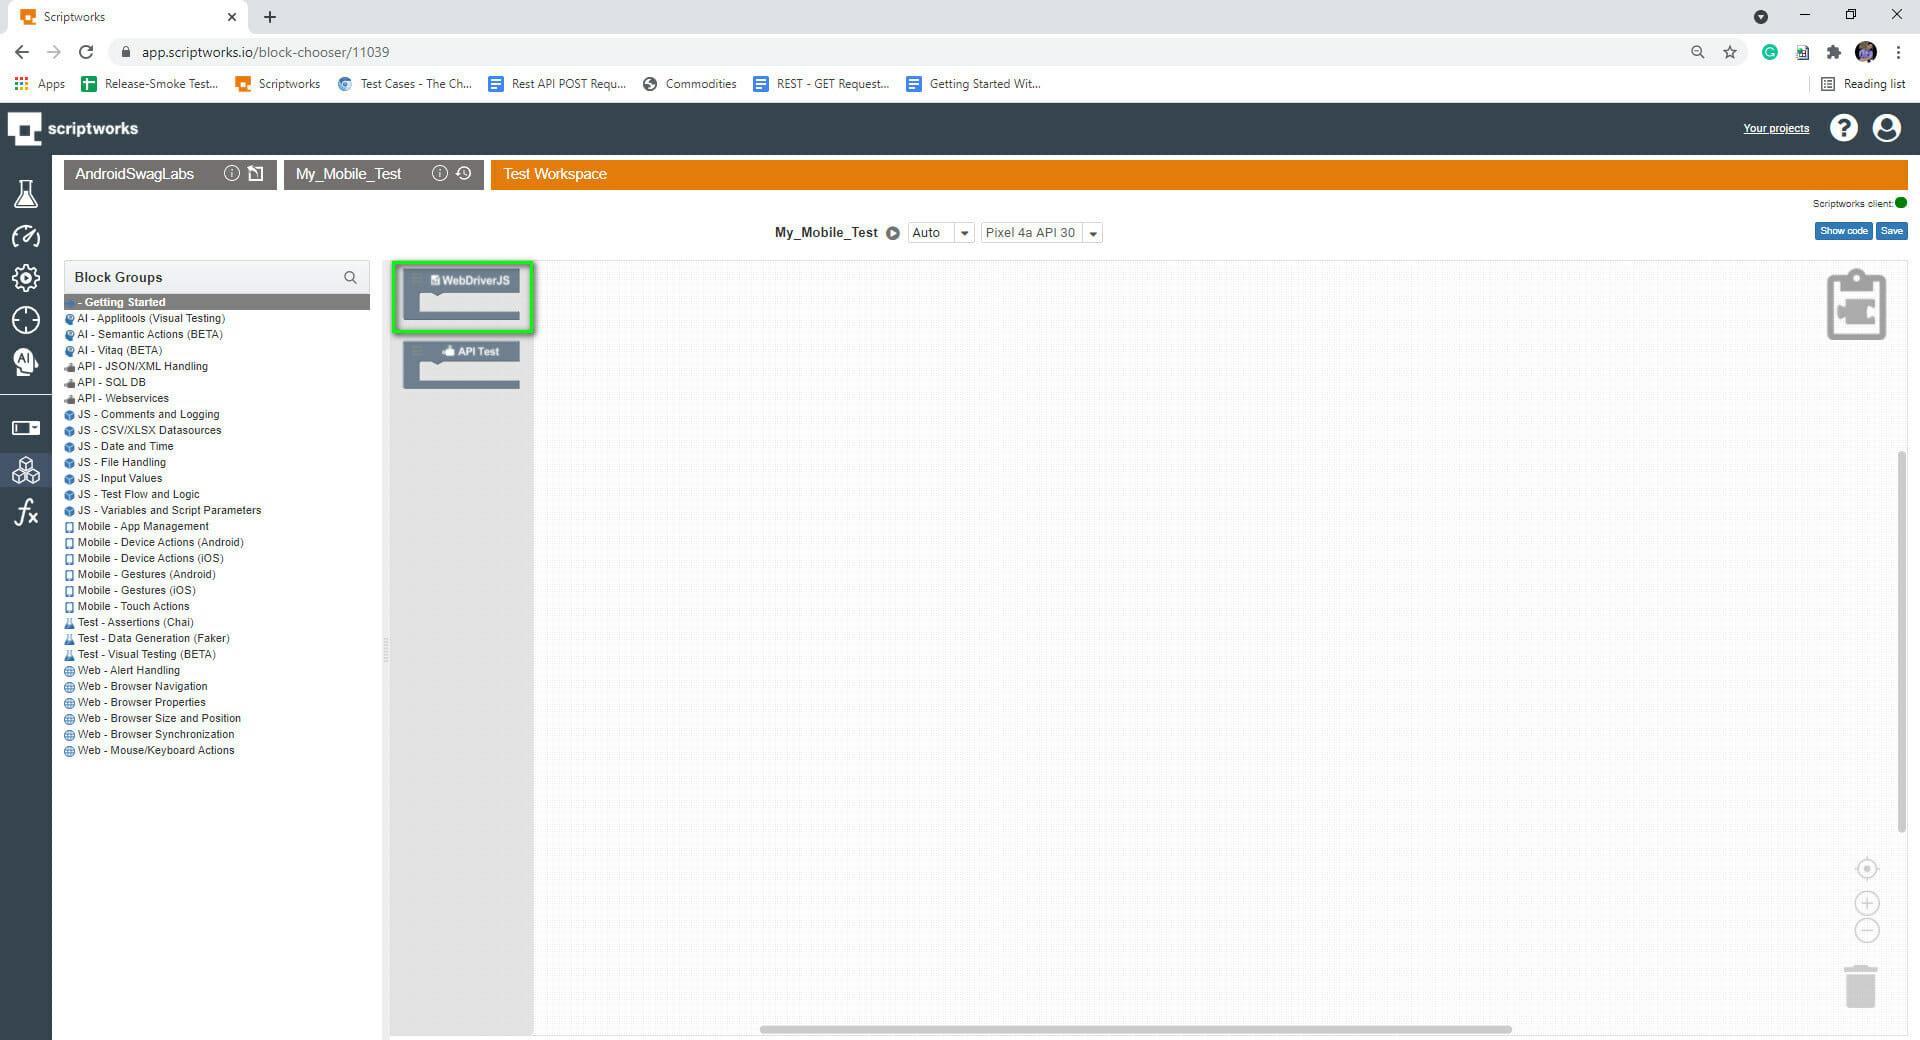 screenshot of selecting webdriverjs